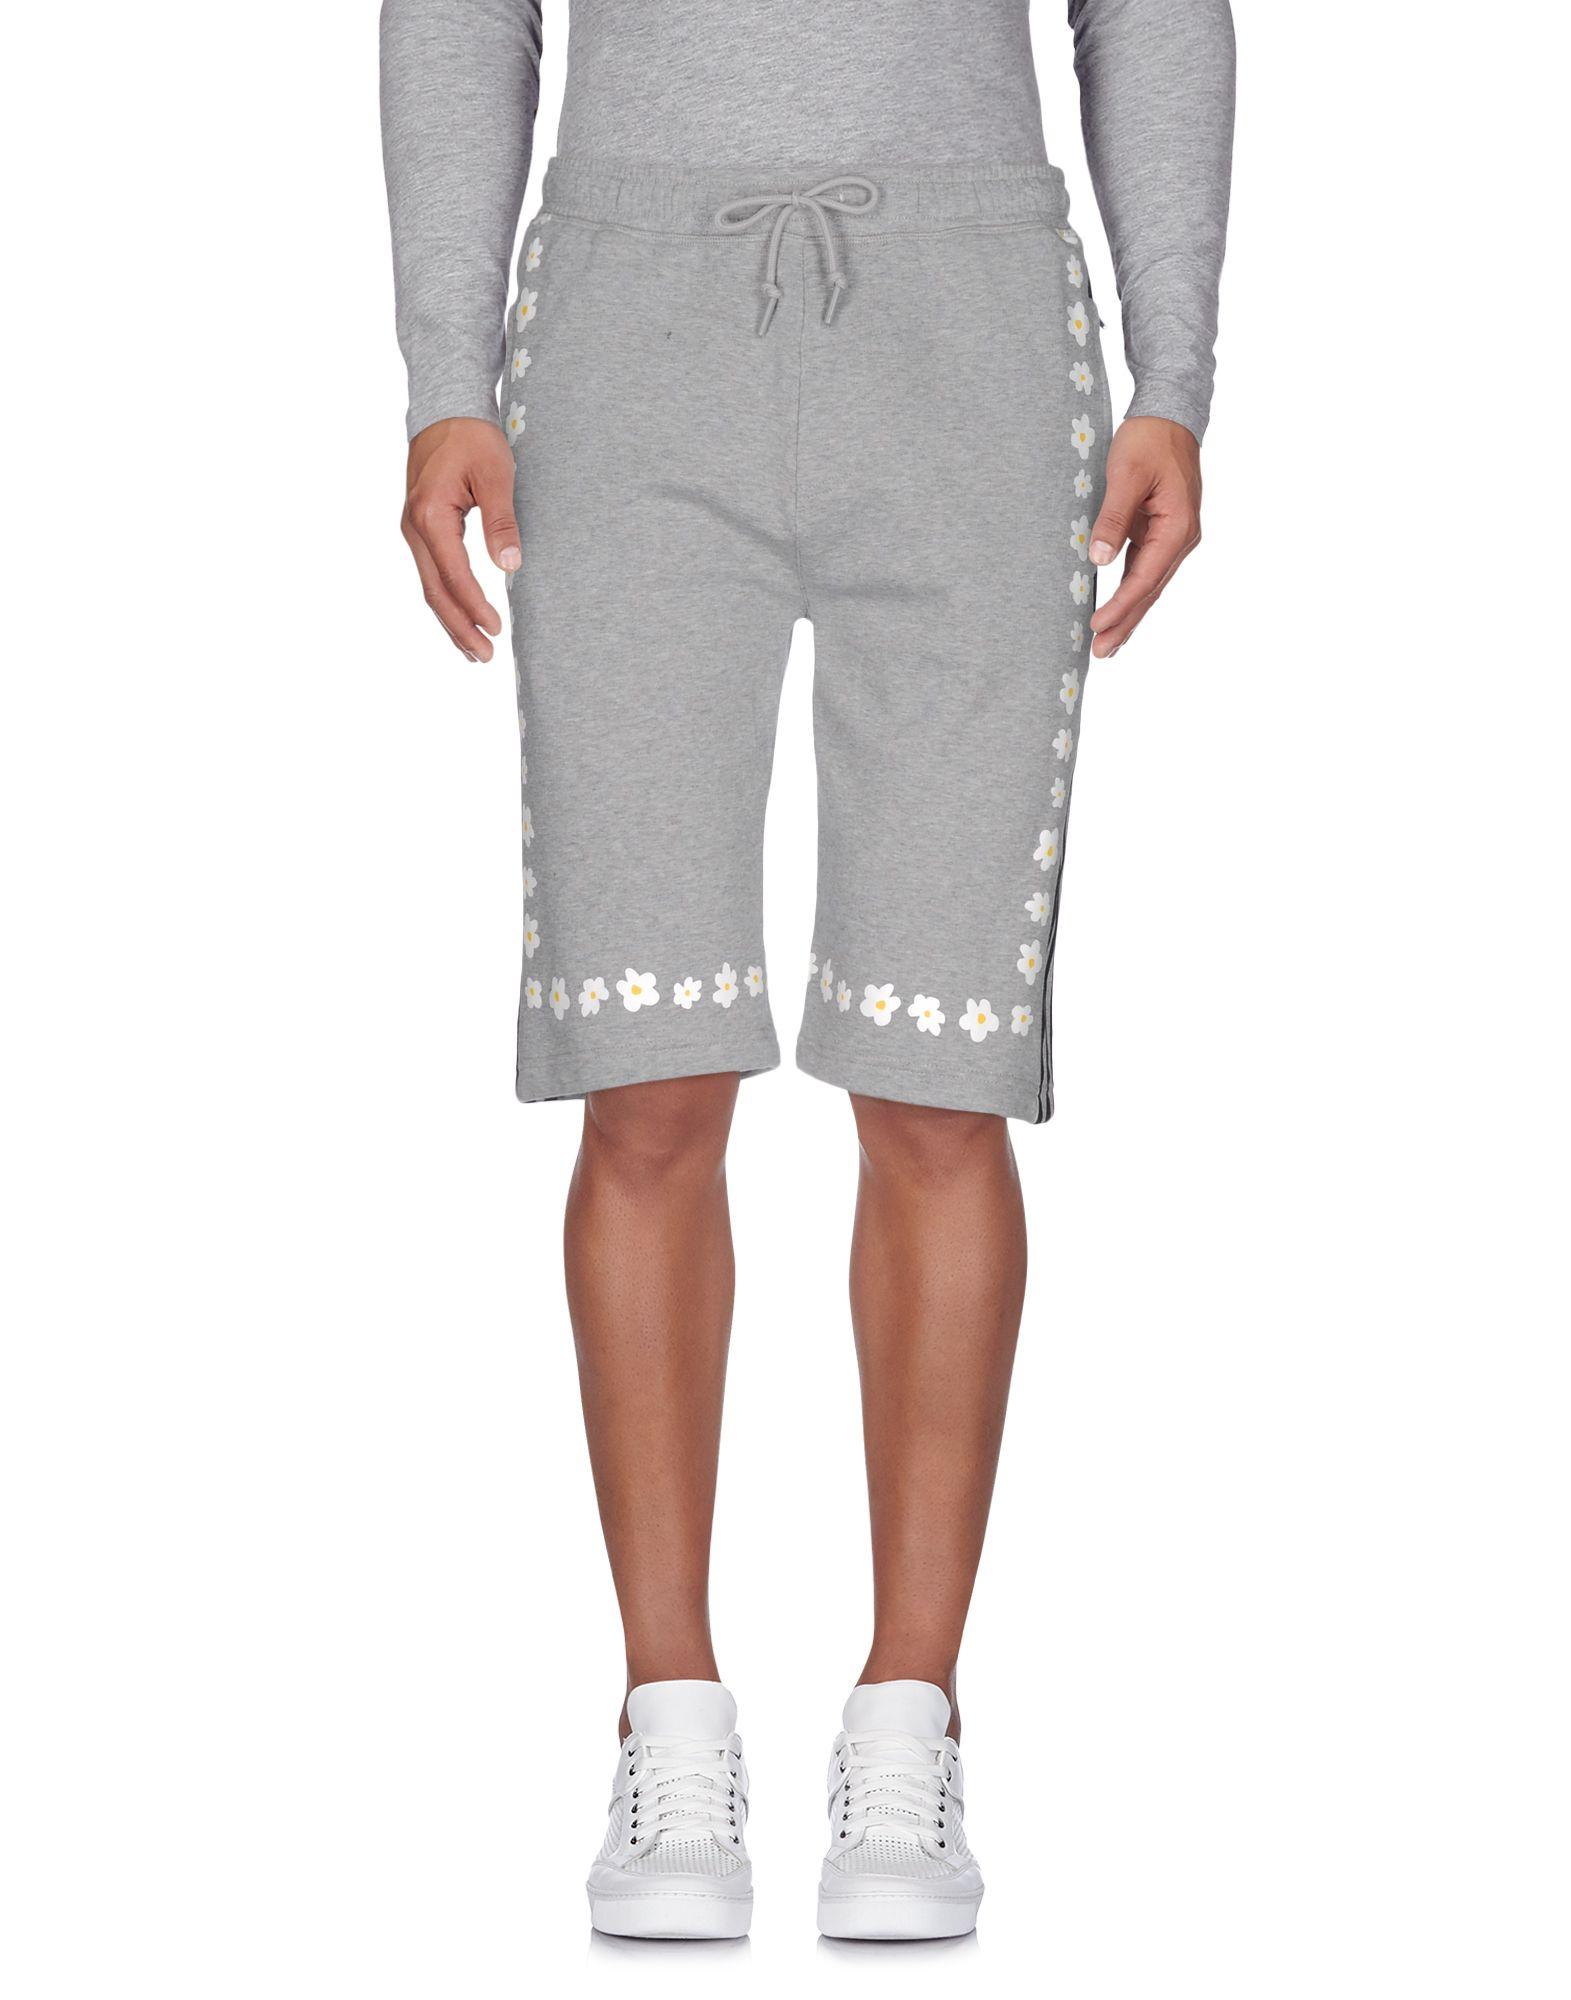 ADIDAS ORIGINALS by PHARRELL WILLIAMS Бермуды adidas x pharrell little kids superstar supercolor